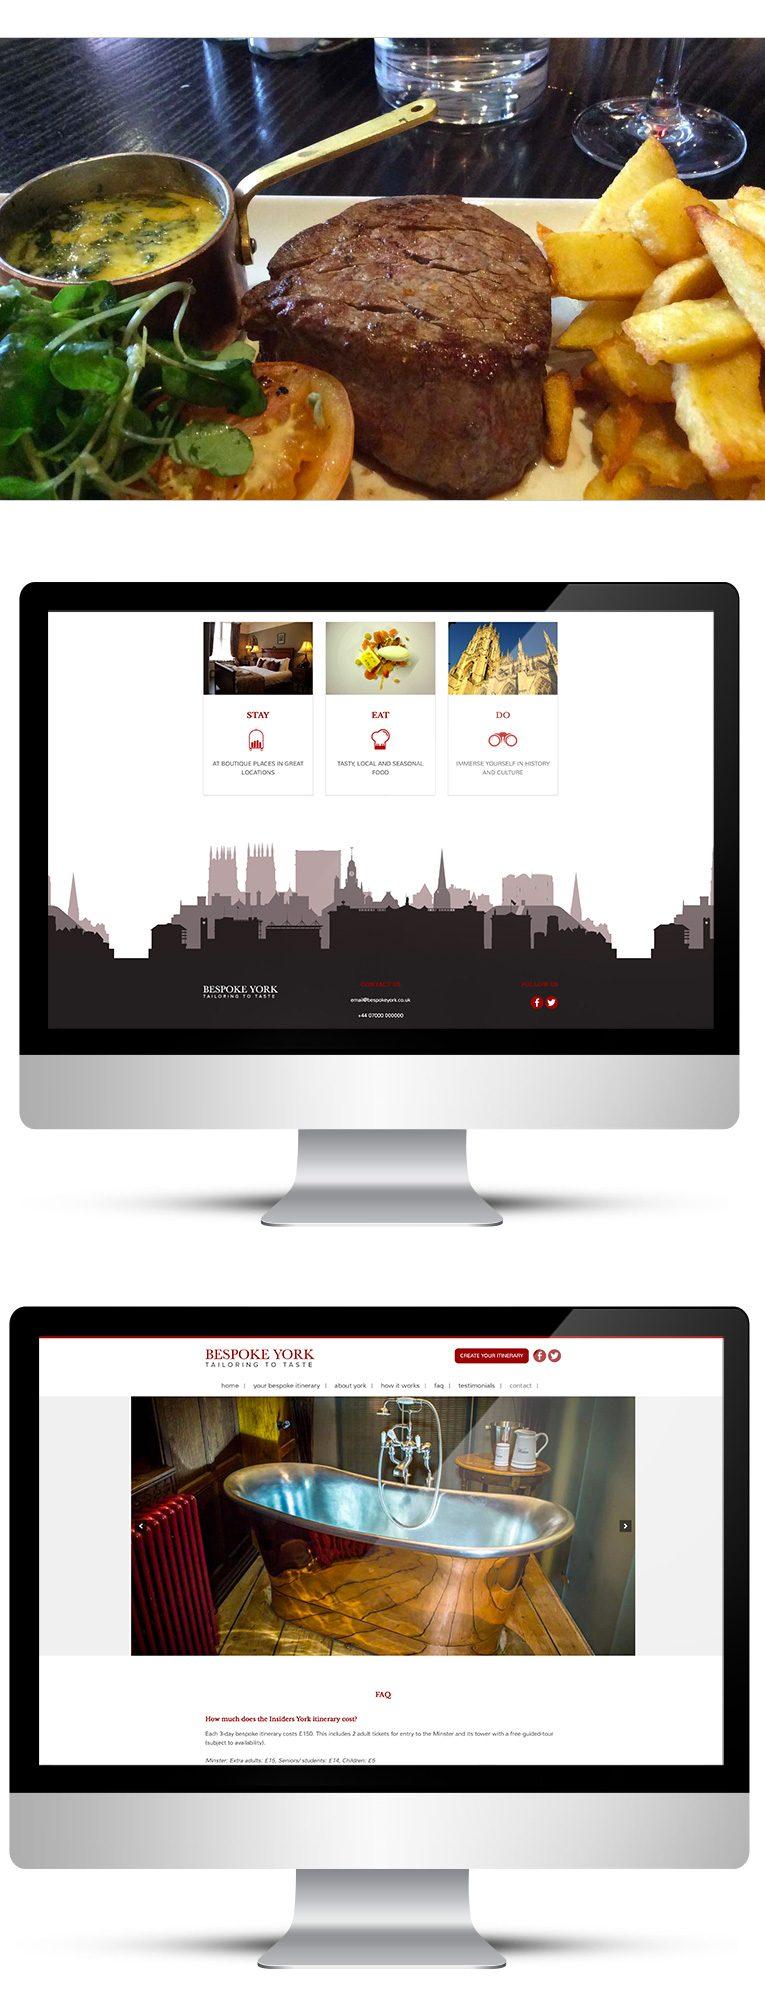 Desktop view, web design for Bespoke York